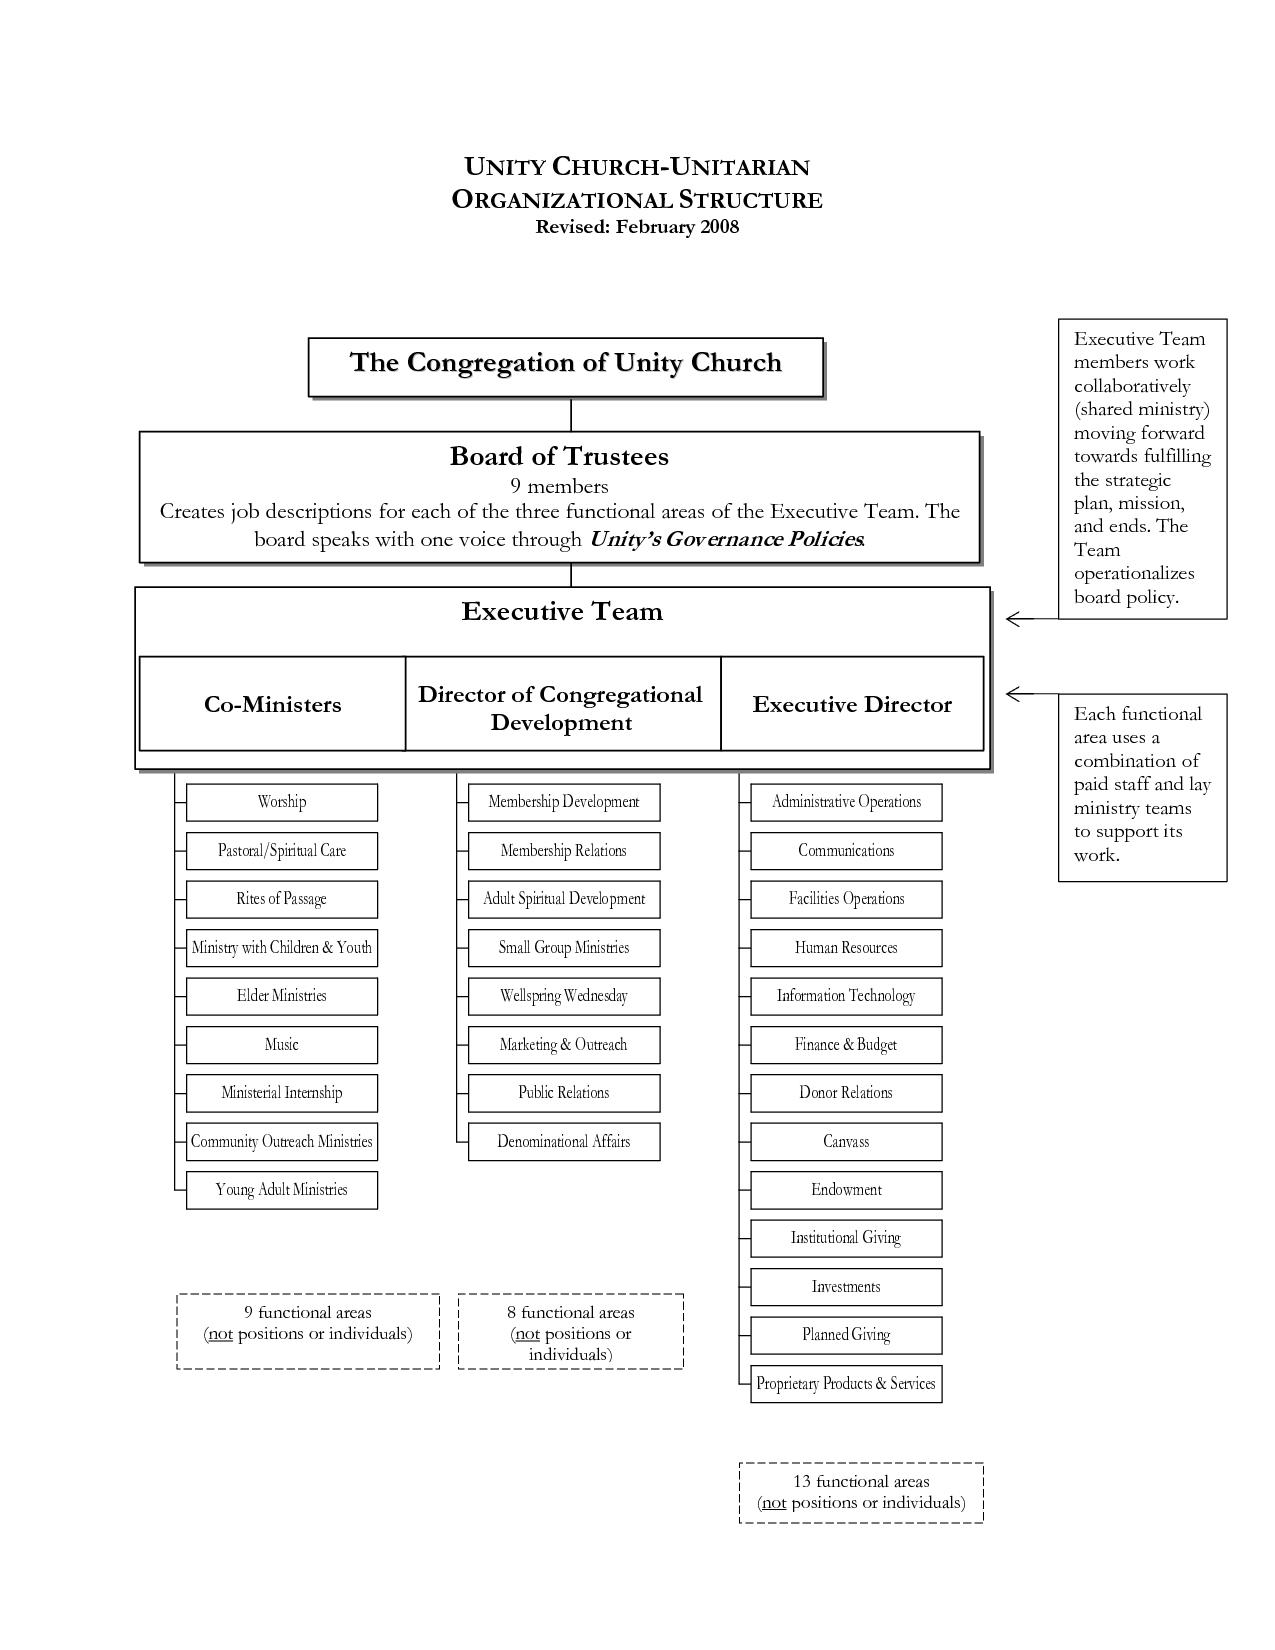 Sample Church Organization Chart  Unity Church Unitarian